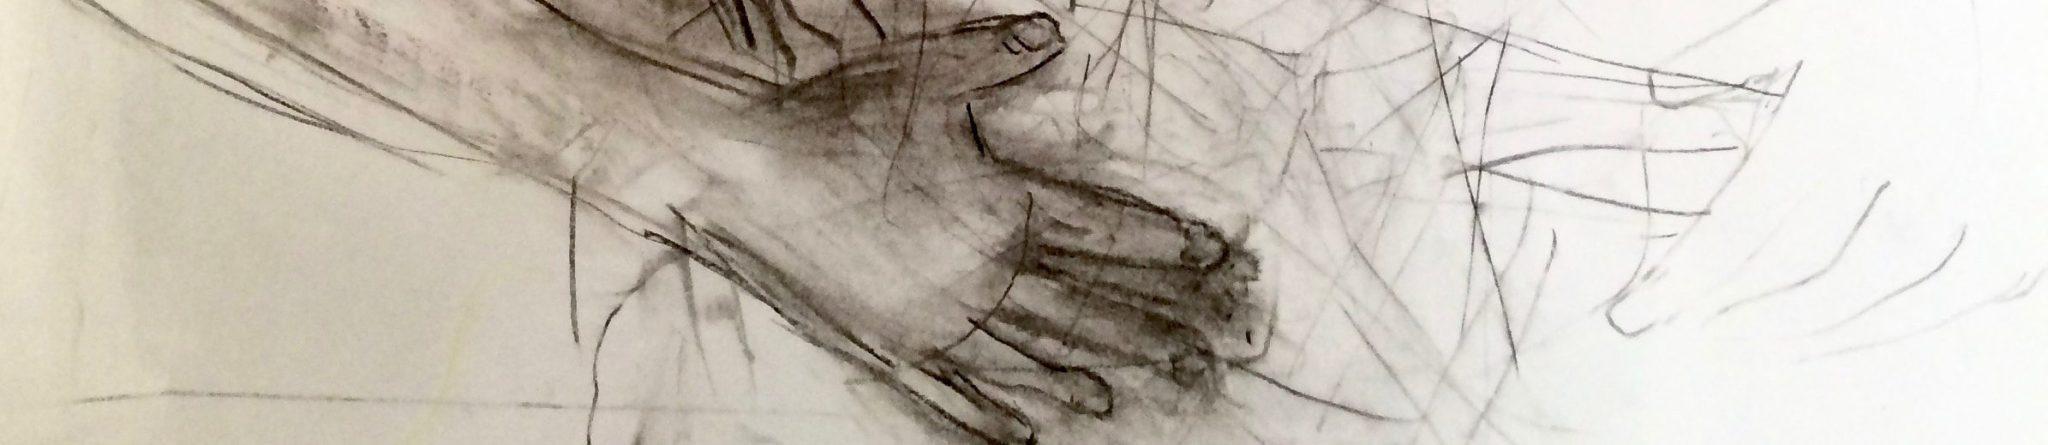 Sketches & Works in Progress